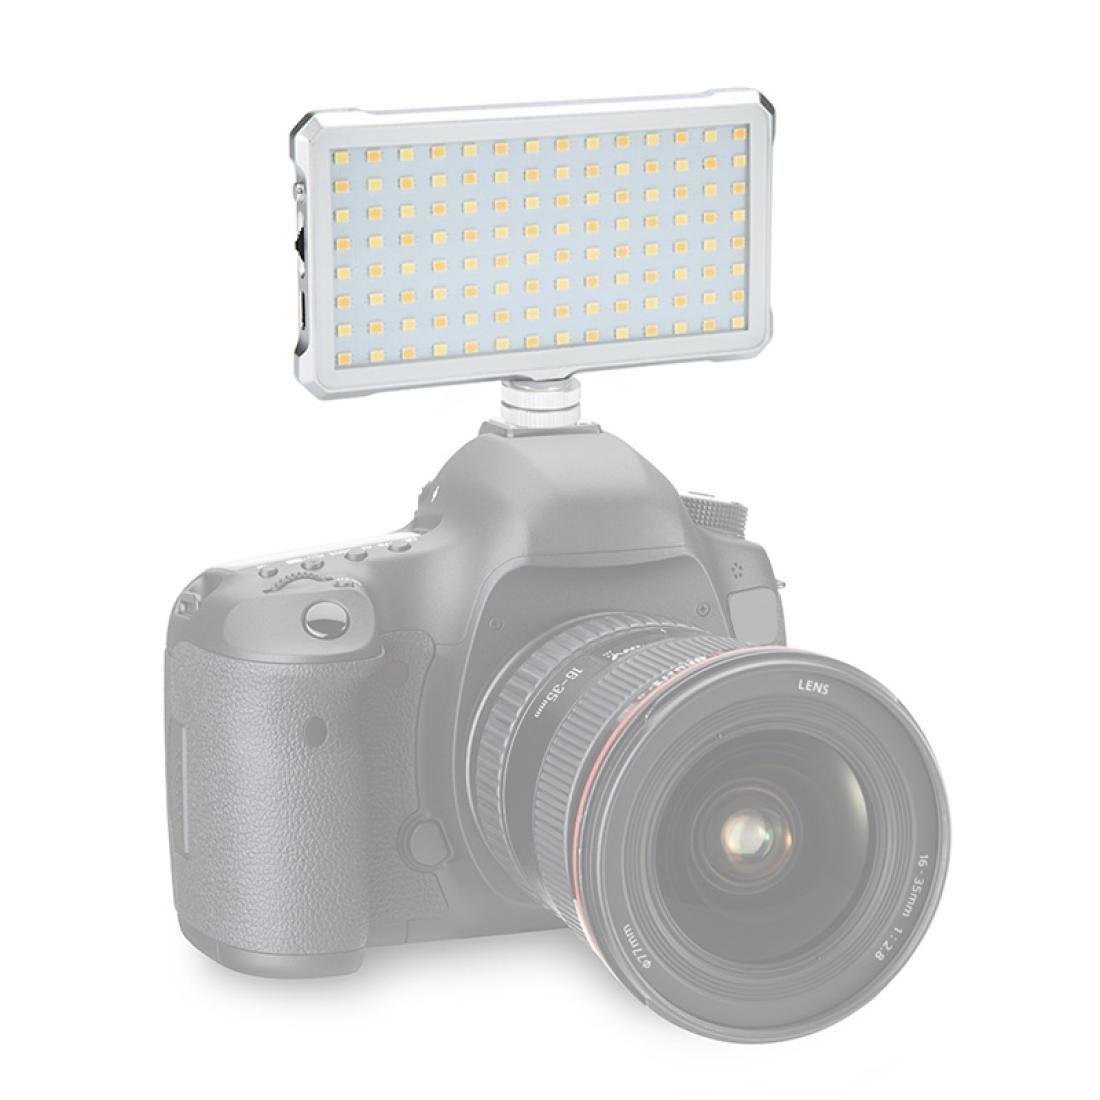 F12 Pocket 112 LEDS 1080LUX Professional Vlogging Photography Photo Studio Light con exhibición OLED para Canon Nikon DSLR Cámaras